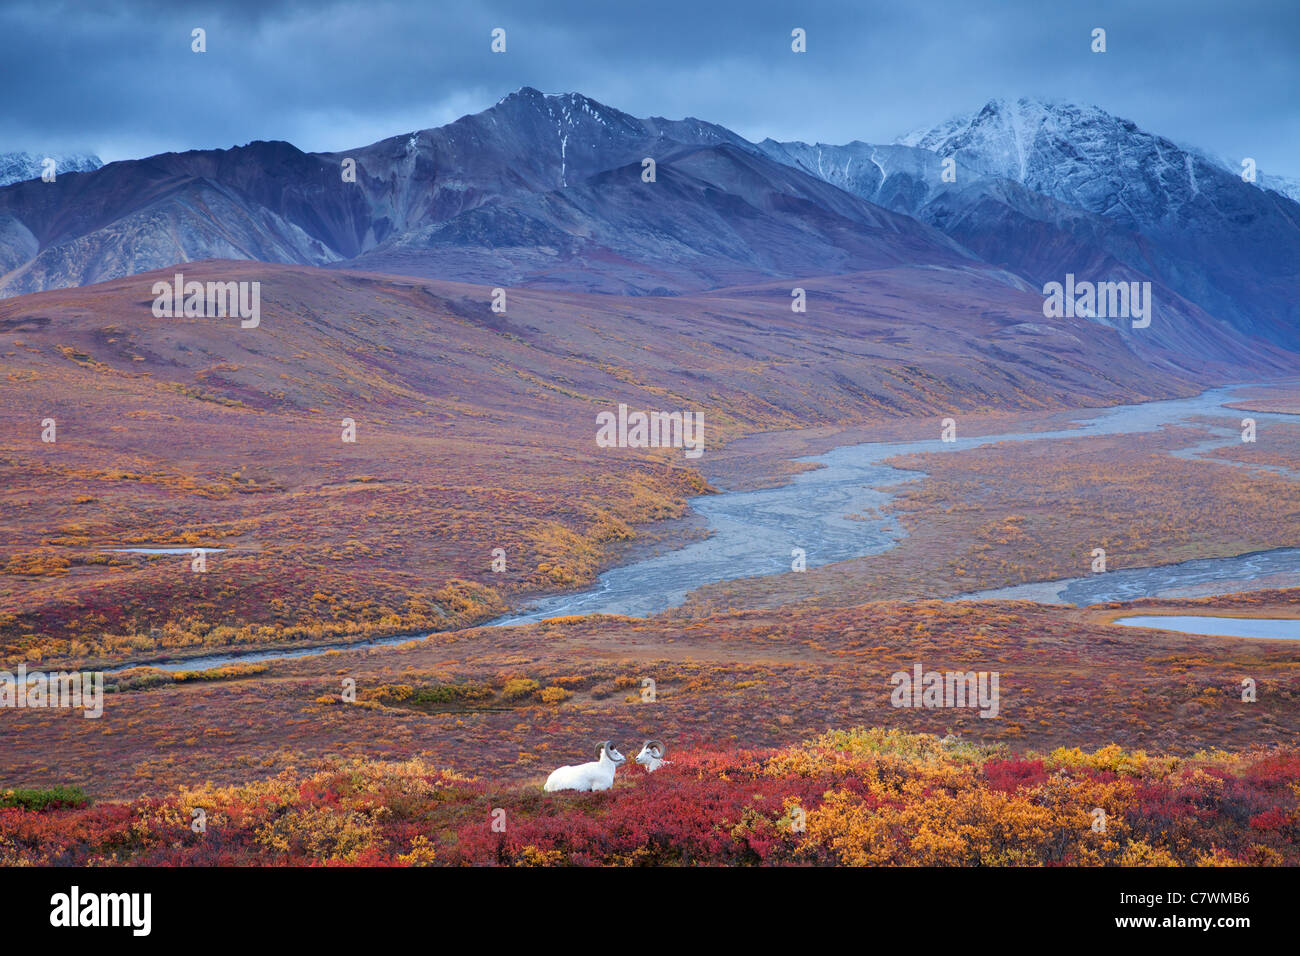 Ovejas de Dall en policromía Pass, el Parque Nacional Denali, Alaska. Imagen De Stock